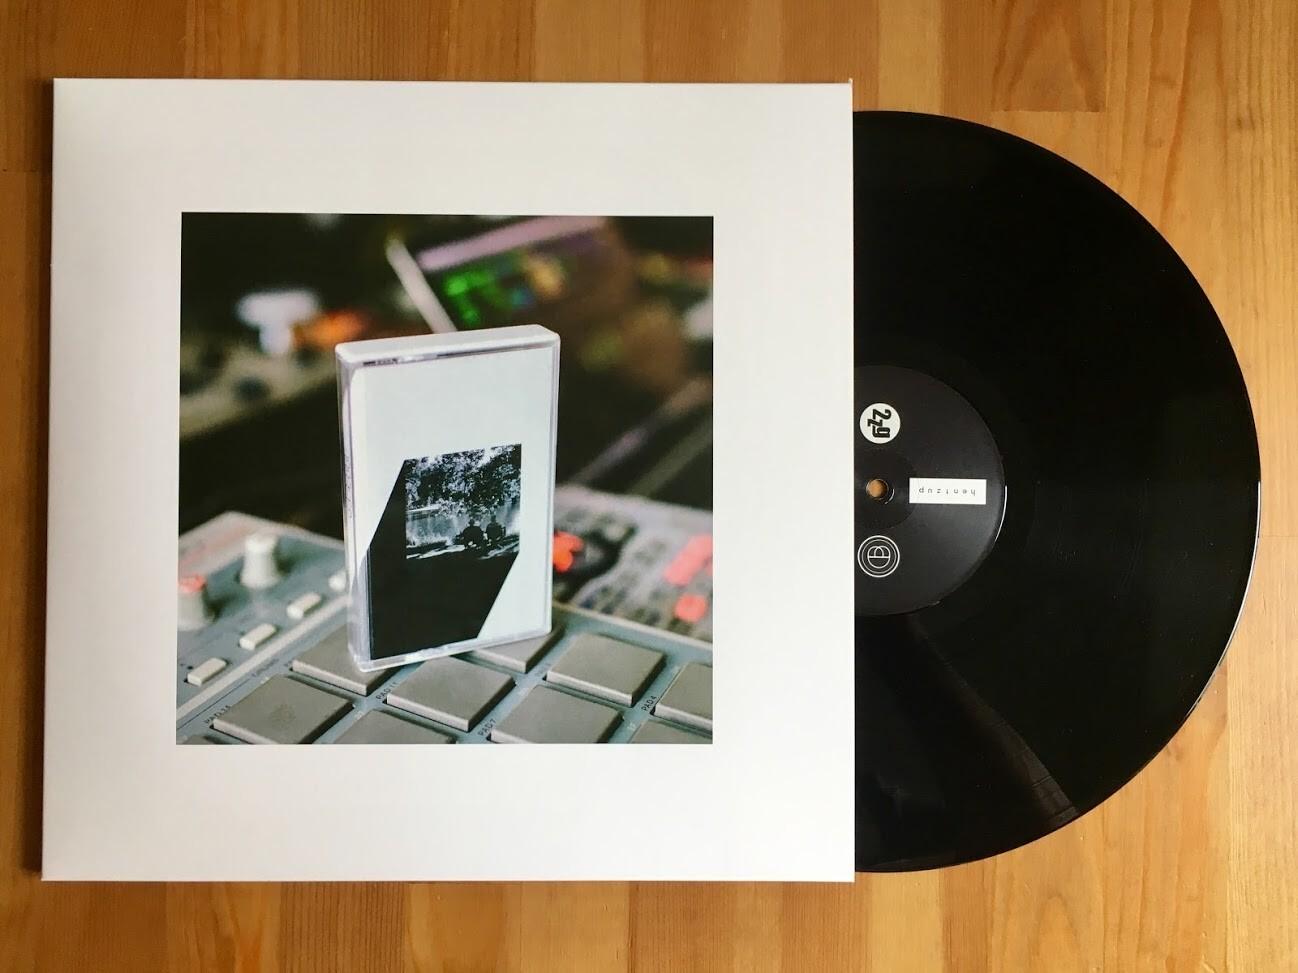 Hentzup - 1993 (Dezi-Belle / 2zg)